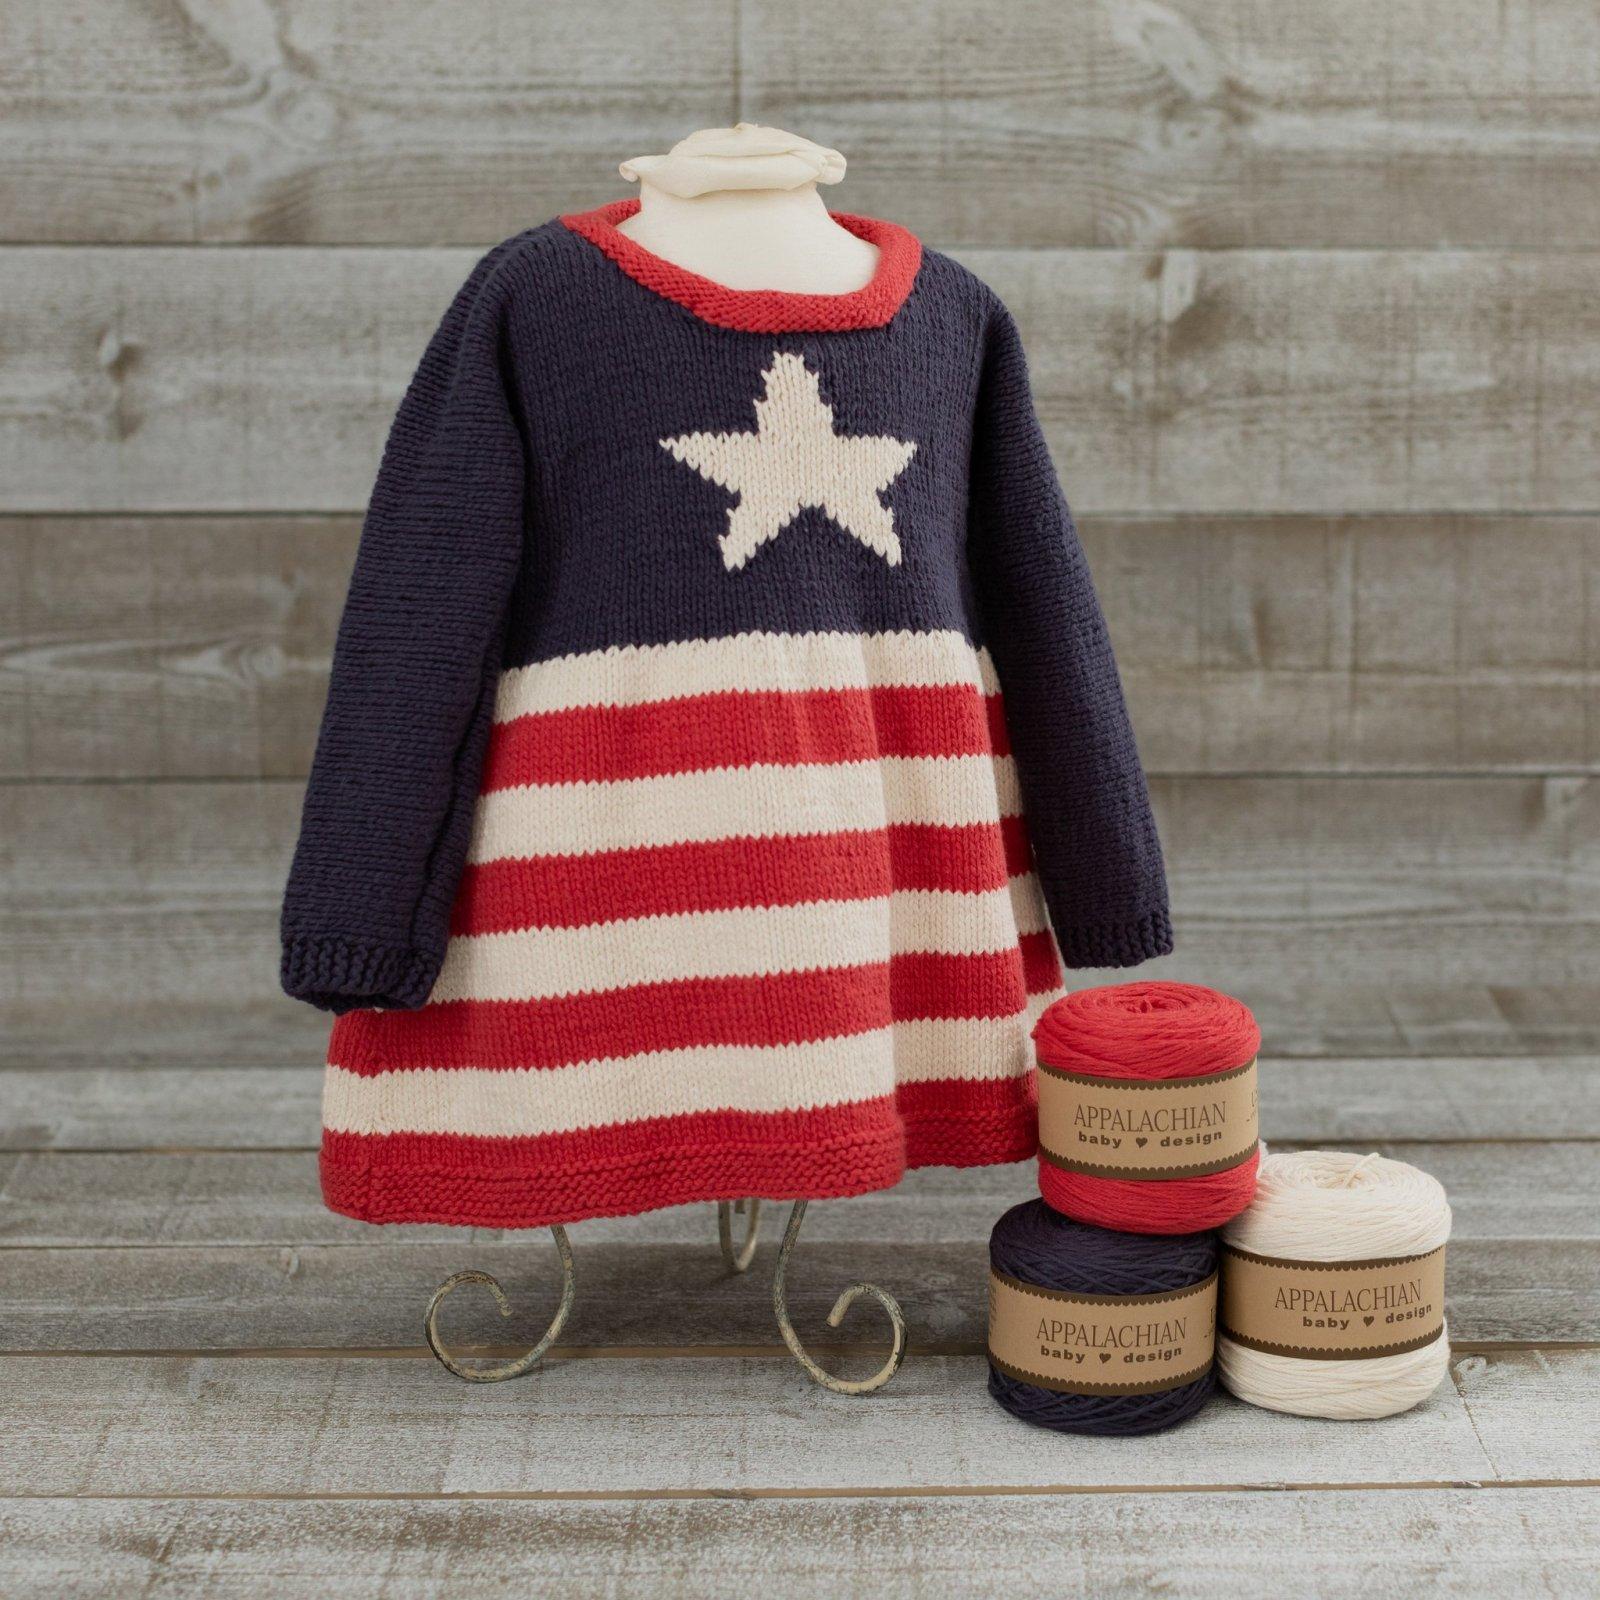 Appalachian Baby Stars & Stripes Dress